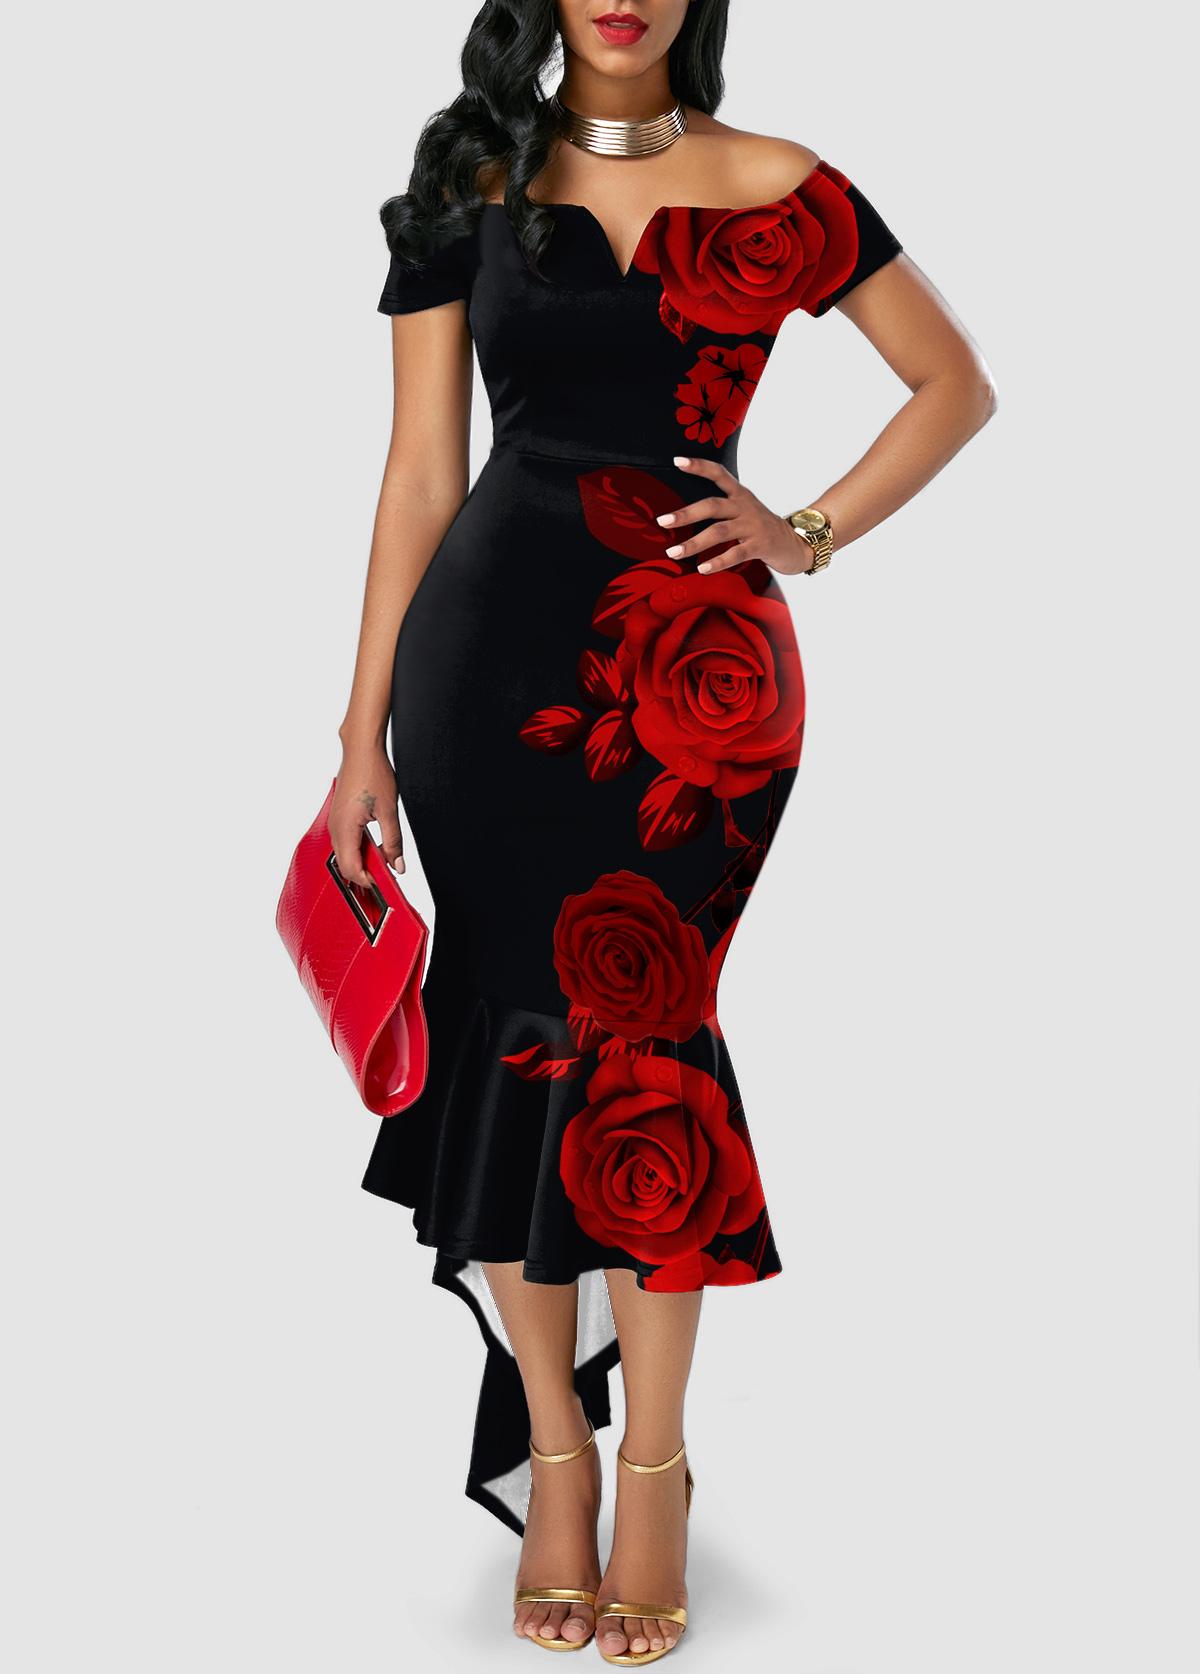 Floral Print Asymmetric Hem Sweetheart Neckline Dress